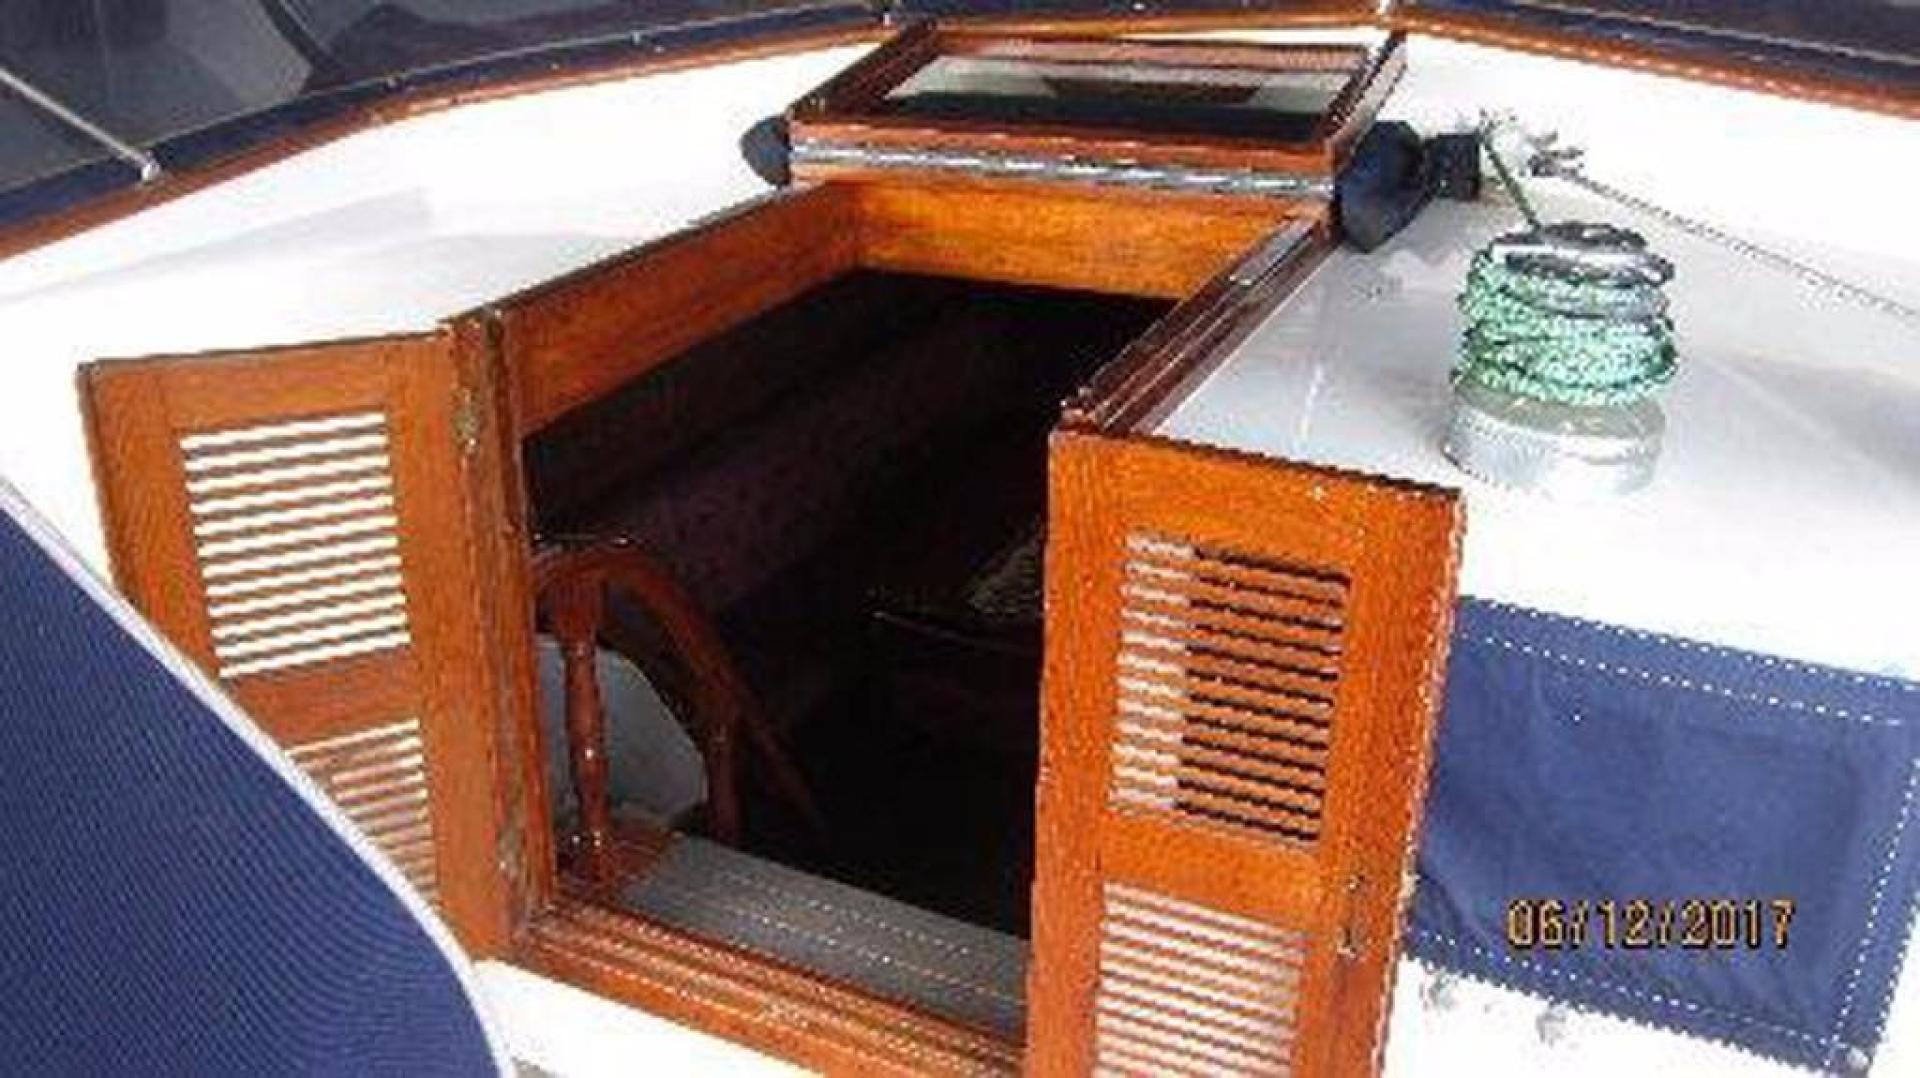 Formosa-Horizon Ketch 1981-Lady Christina Kemah-Texas-United States-Cockpit Hatch-389524 | Thumbnail